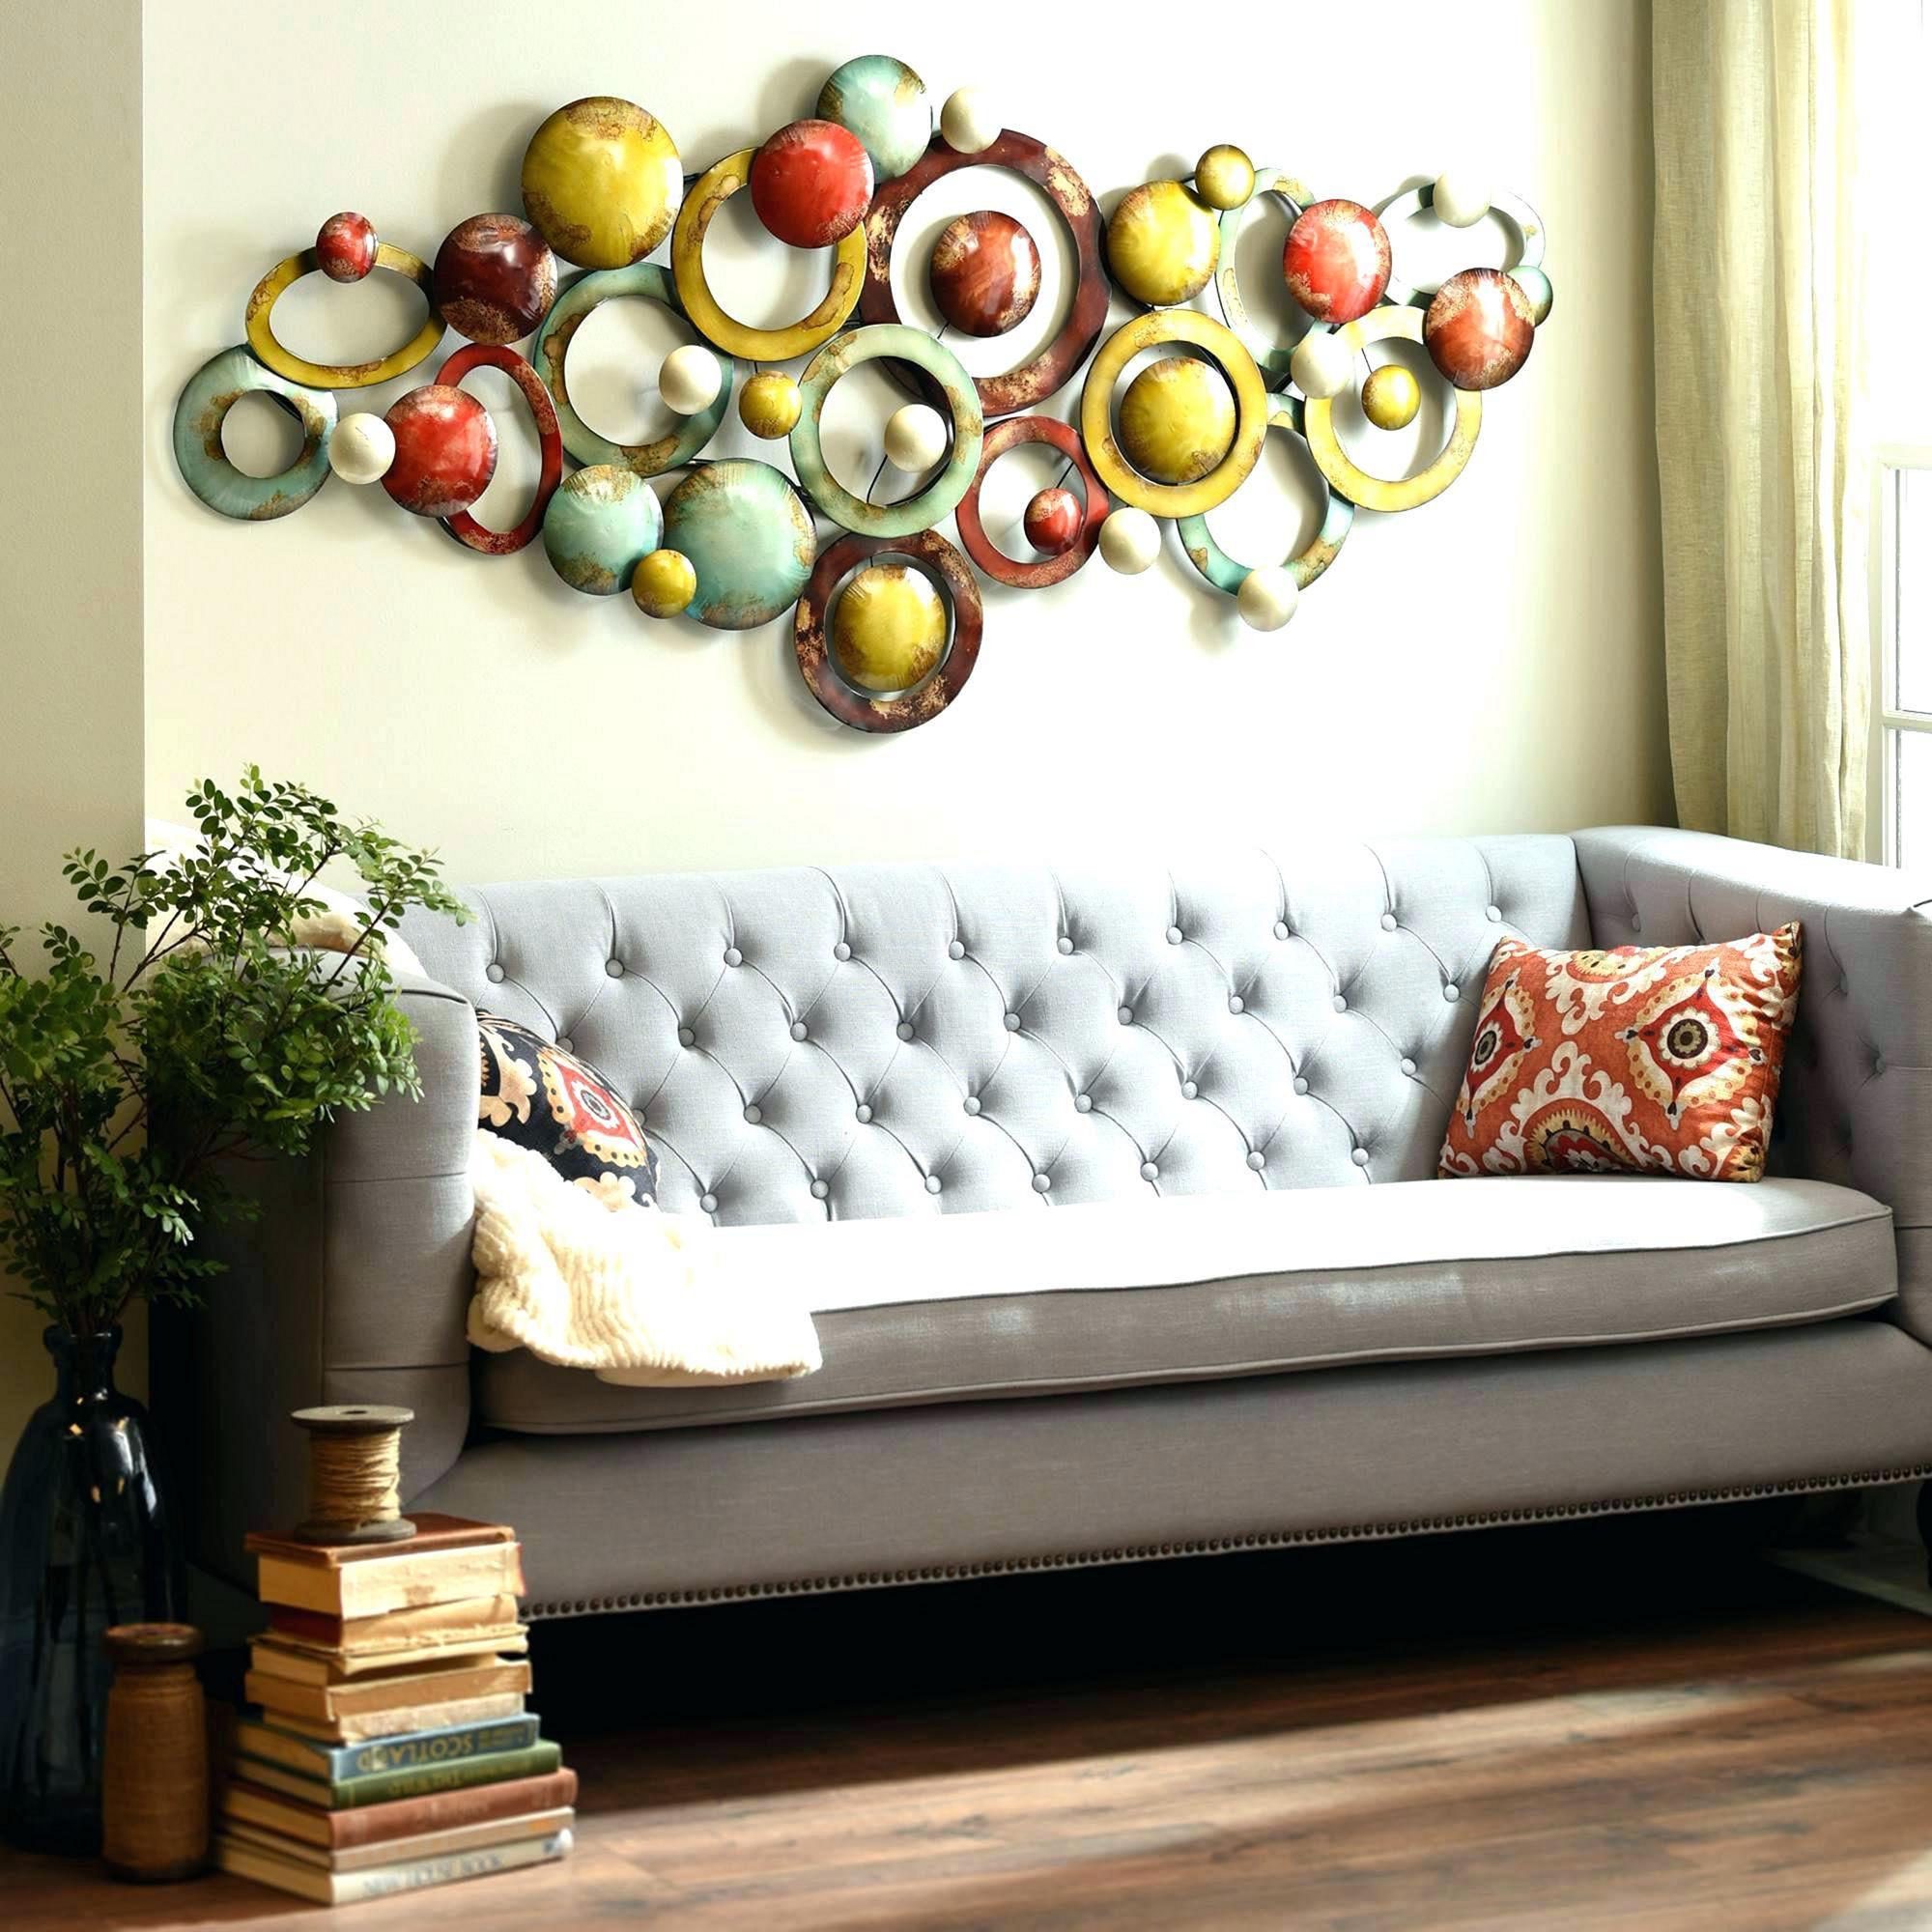 25+ Unique Wall Decor Design Ideas For Beauty Living Room ...